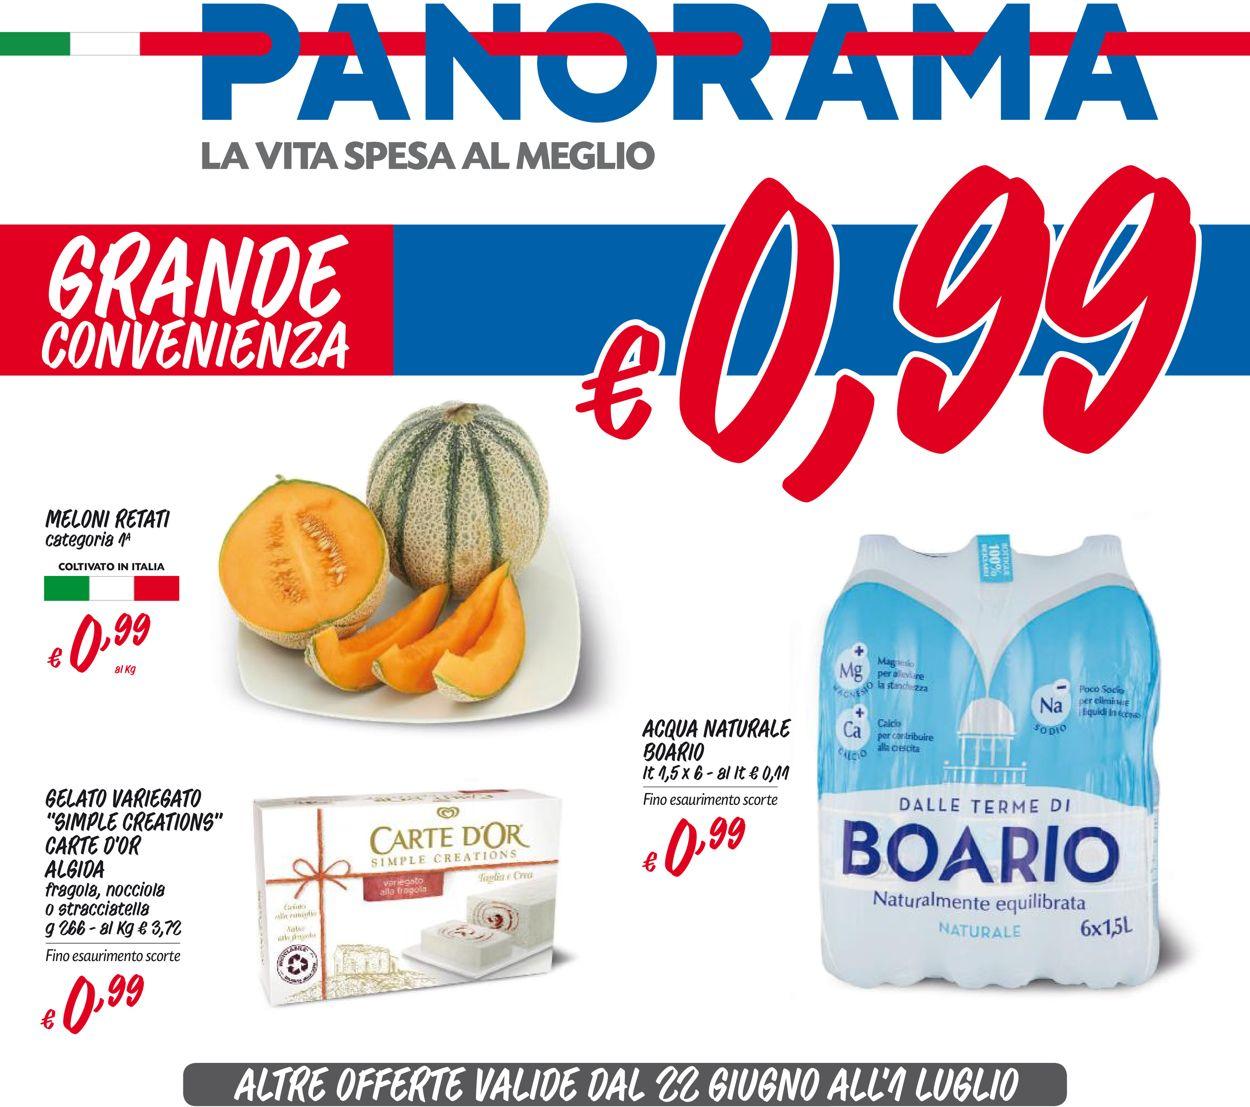 Volantino Pam Panorama - Offerte 22/06-01/07/2020